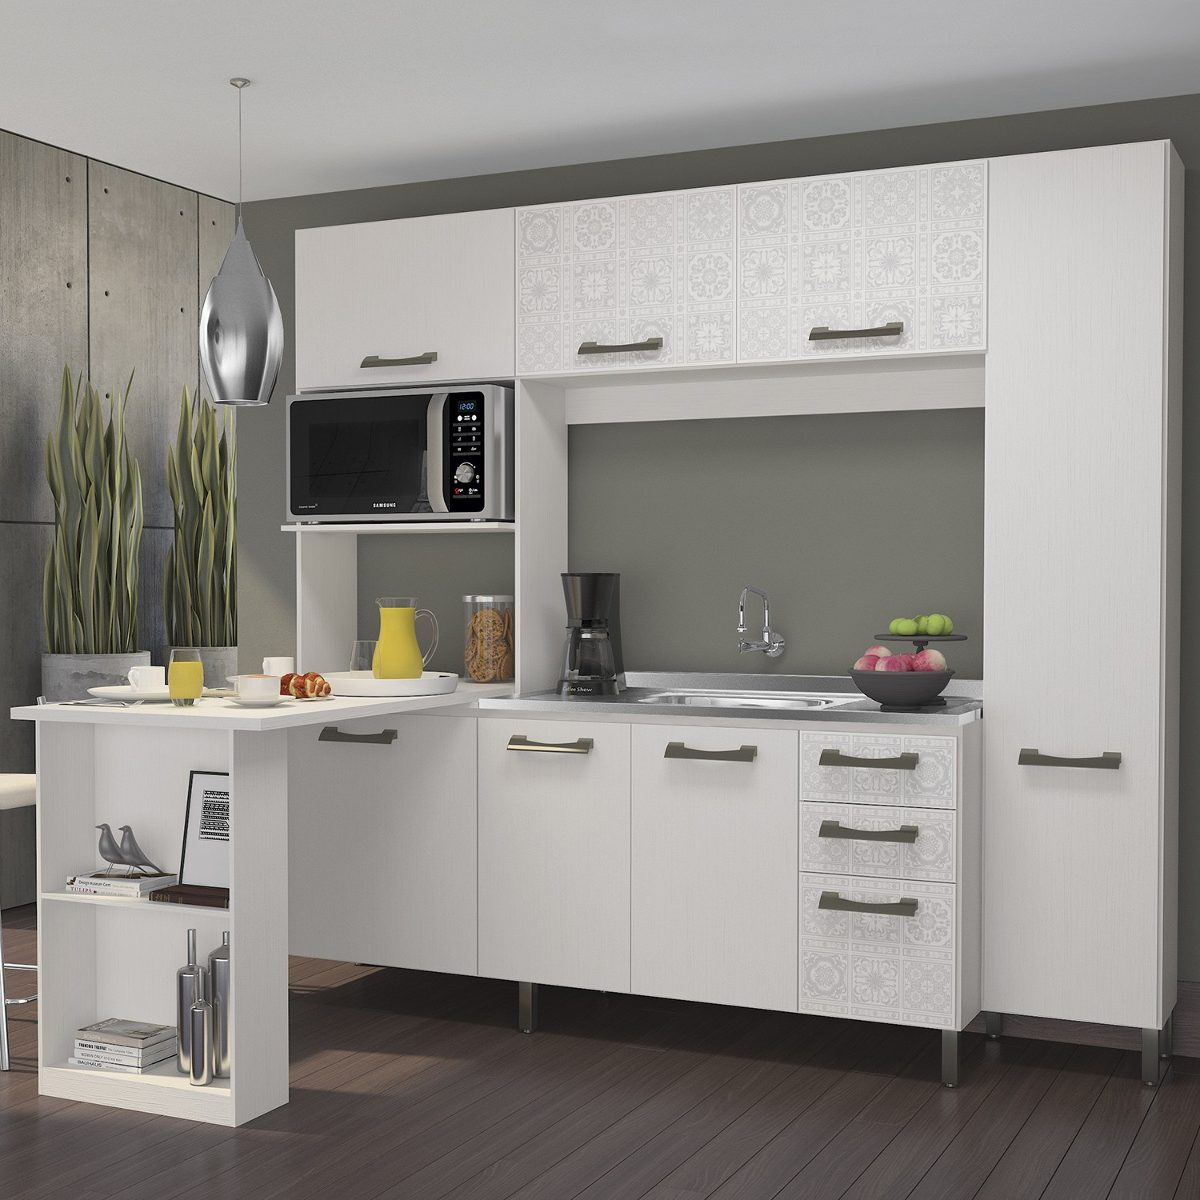 Cozinha Compacta Com Bancada F780 Kappesberg Branco Wt R 1 027 10